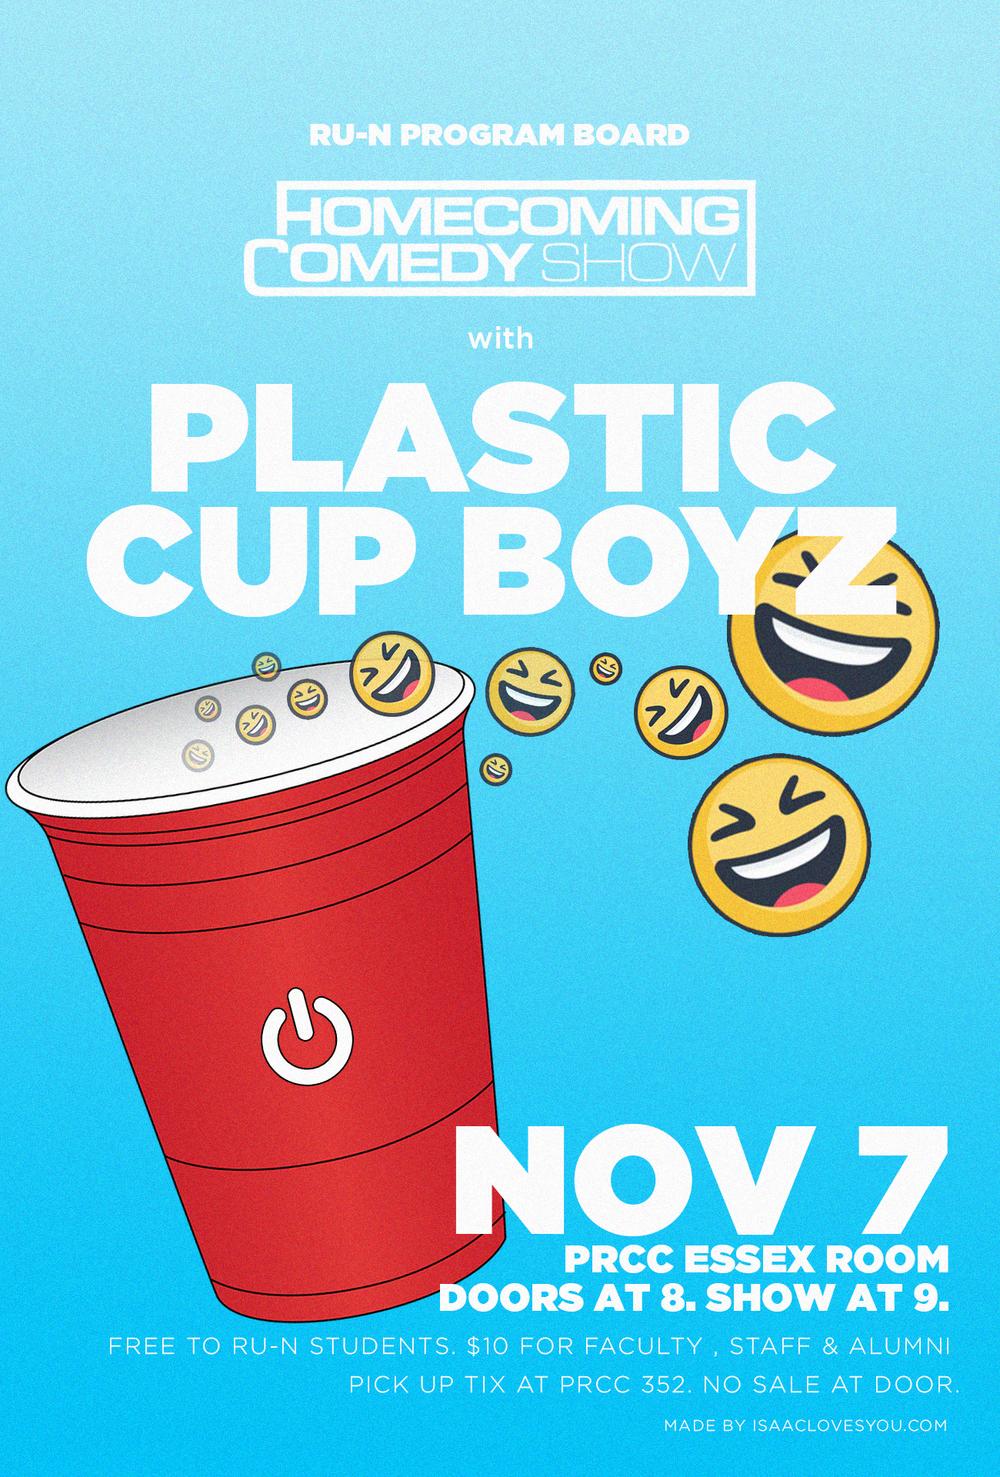 PlasticCupBoys.png